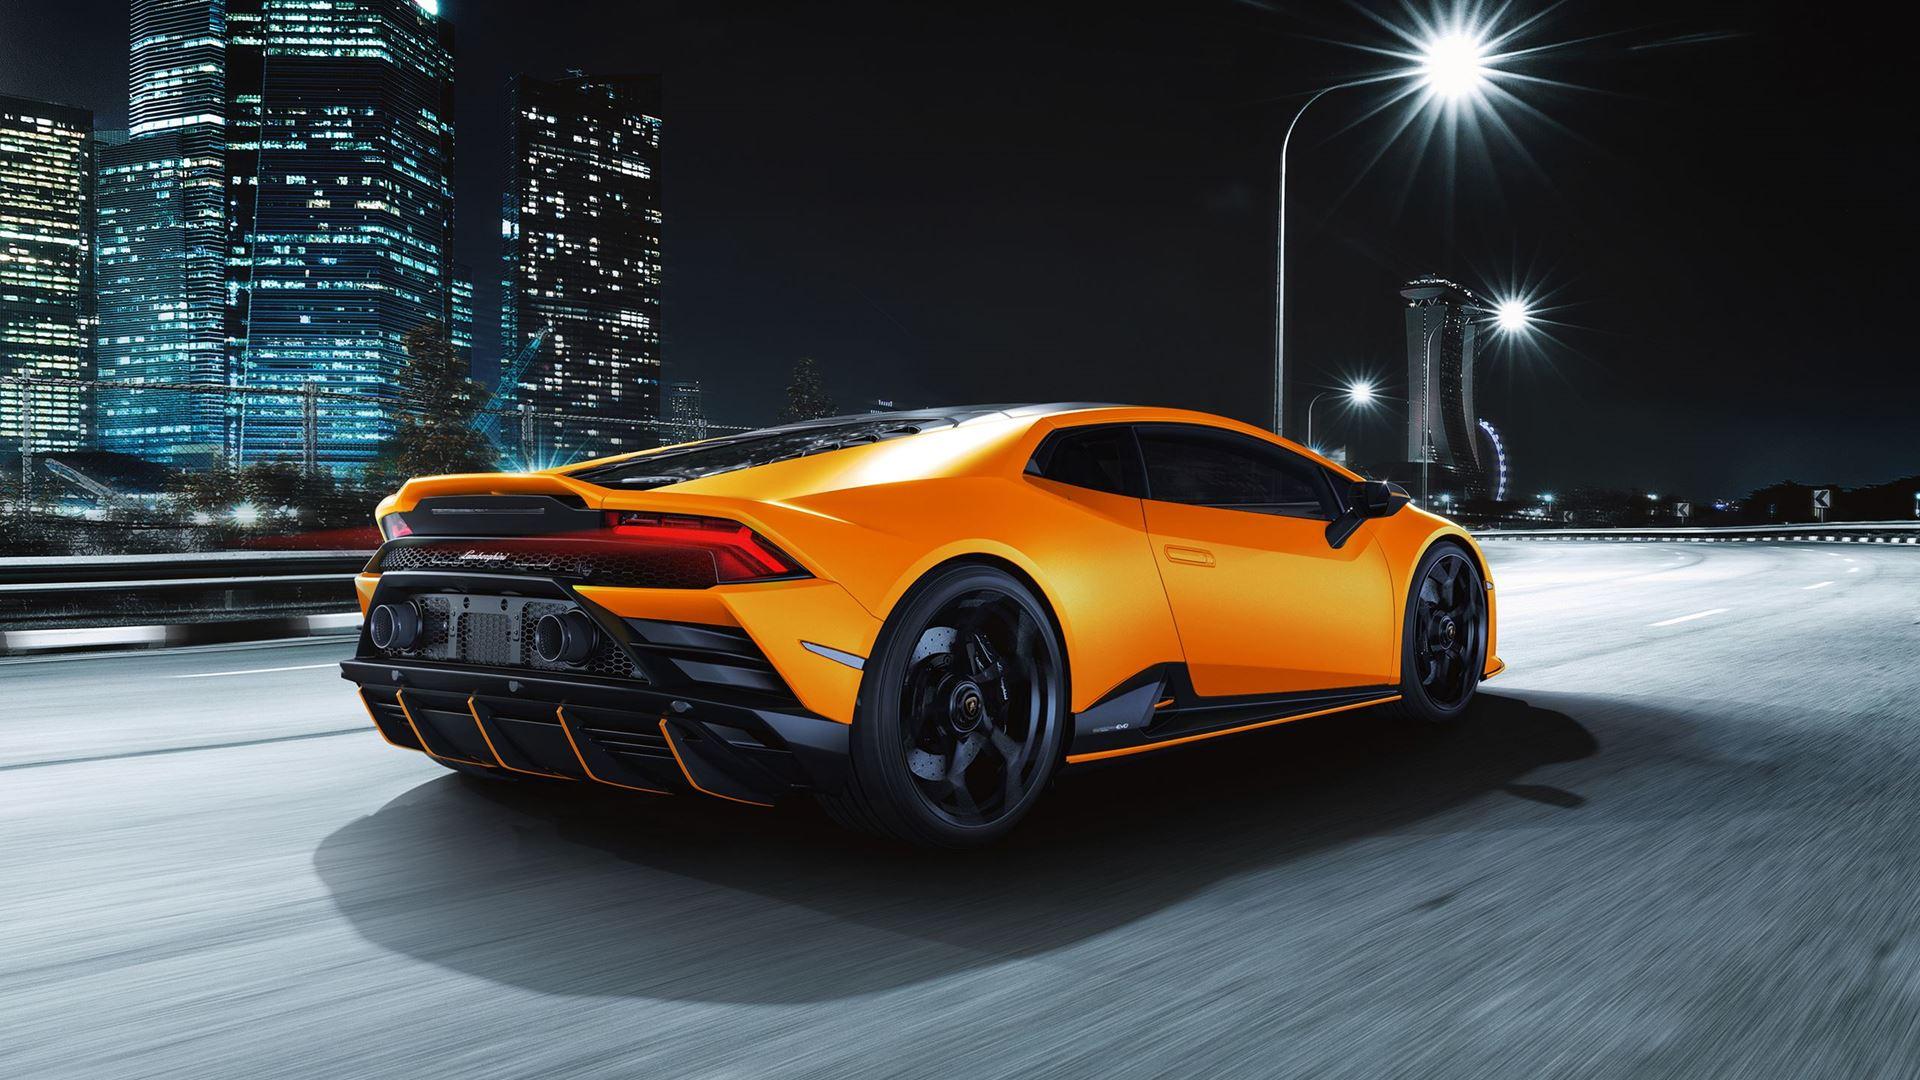 Daring elegance: Automobili Lamborghini presents the Huracán EVO Fluo Capsule - Image 7